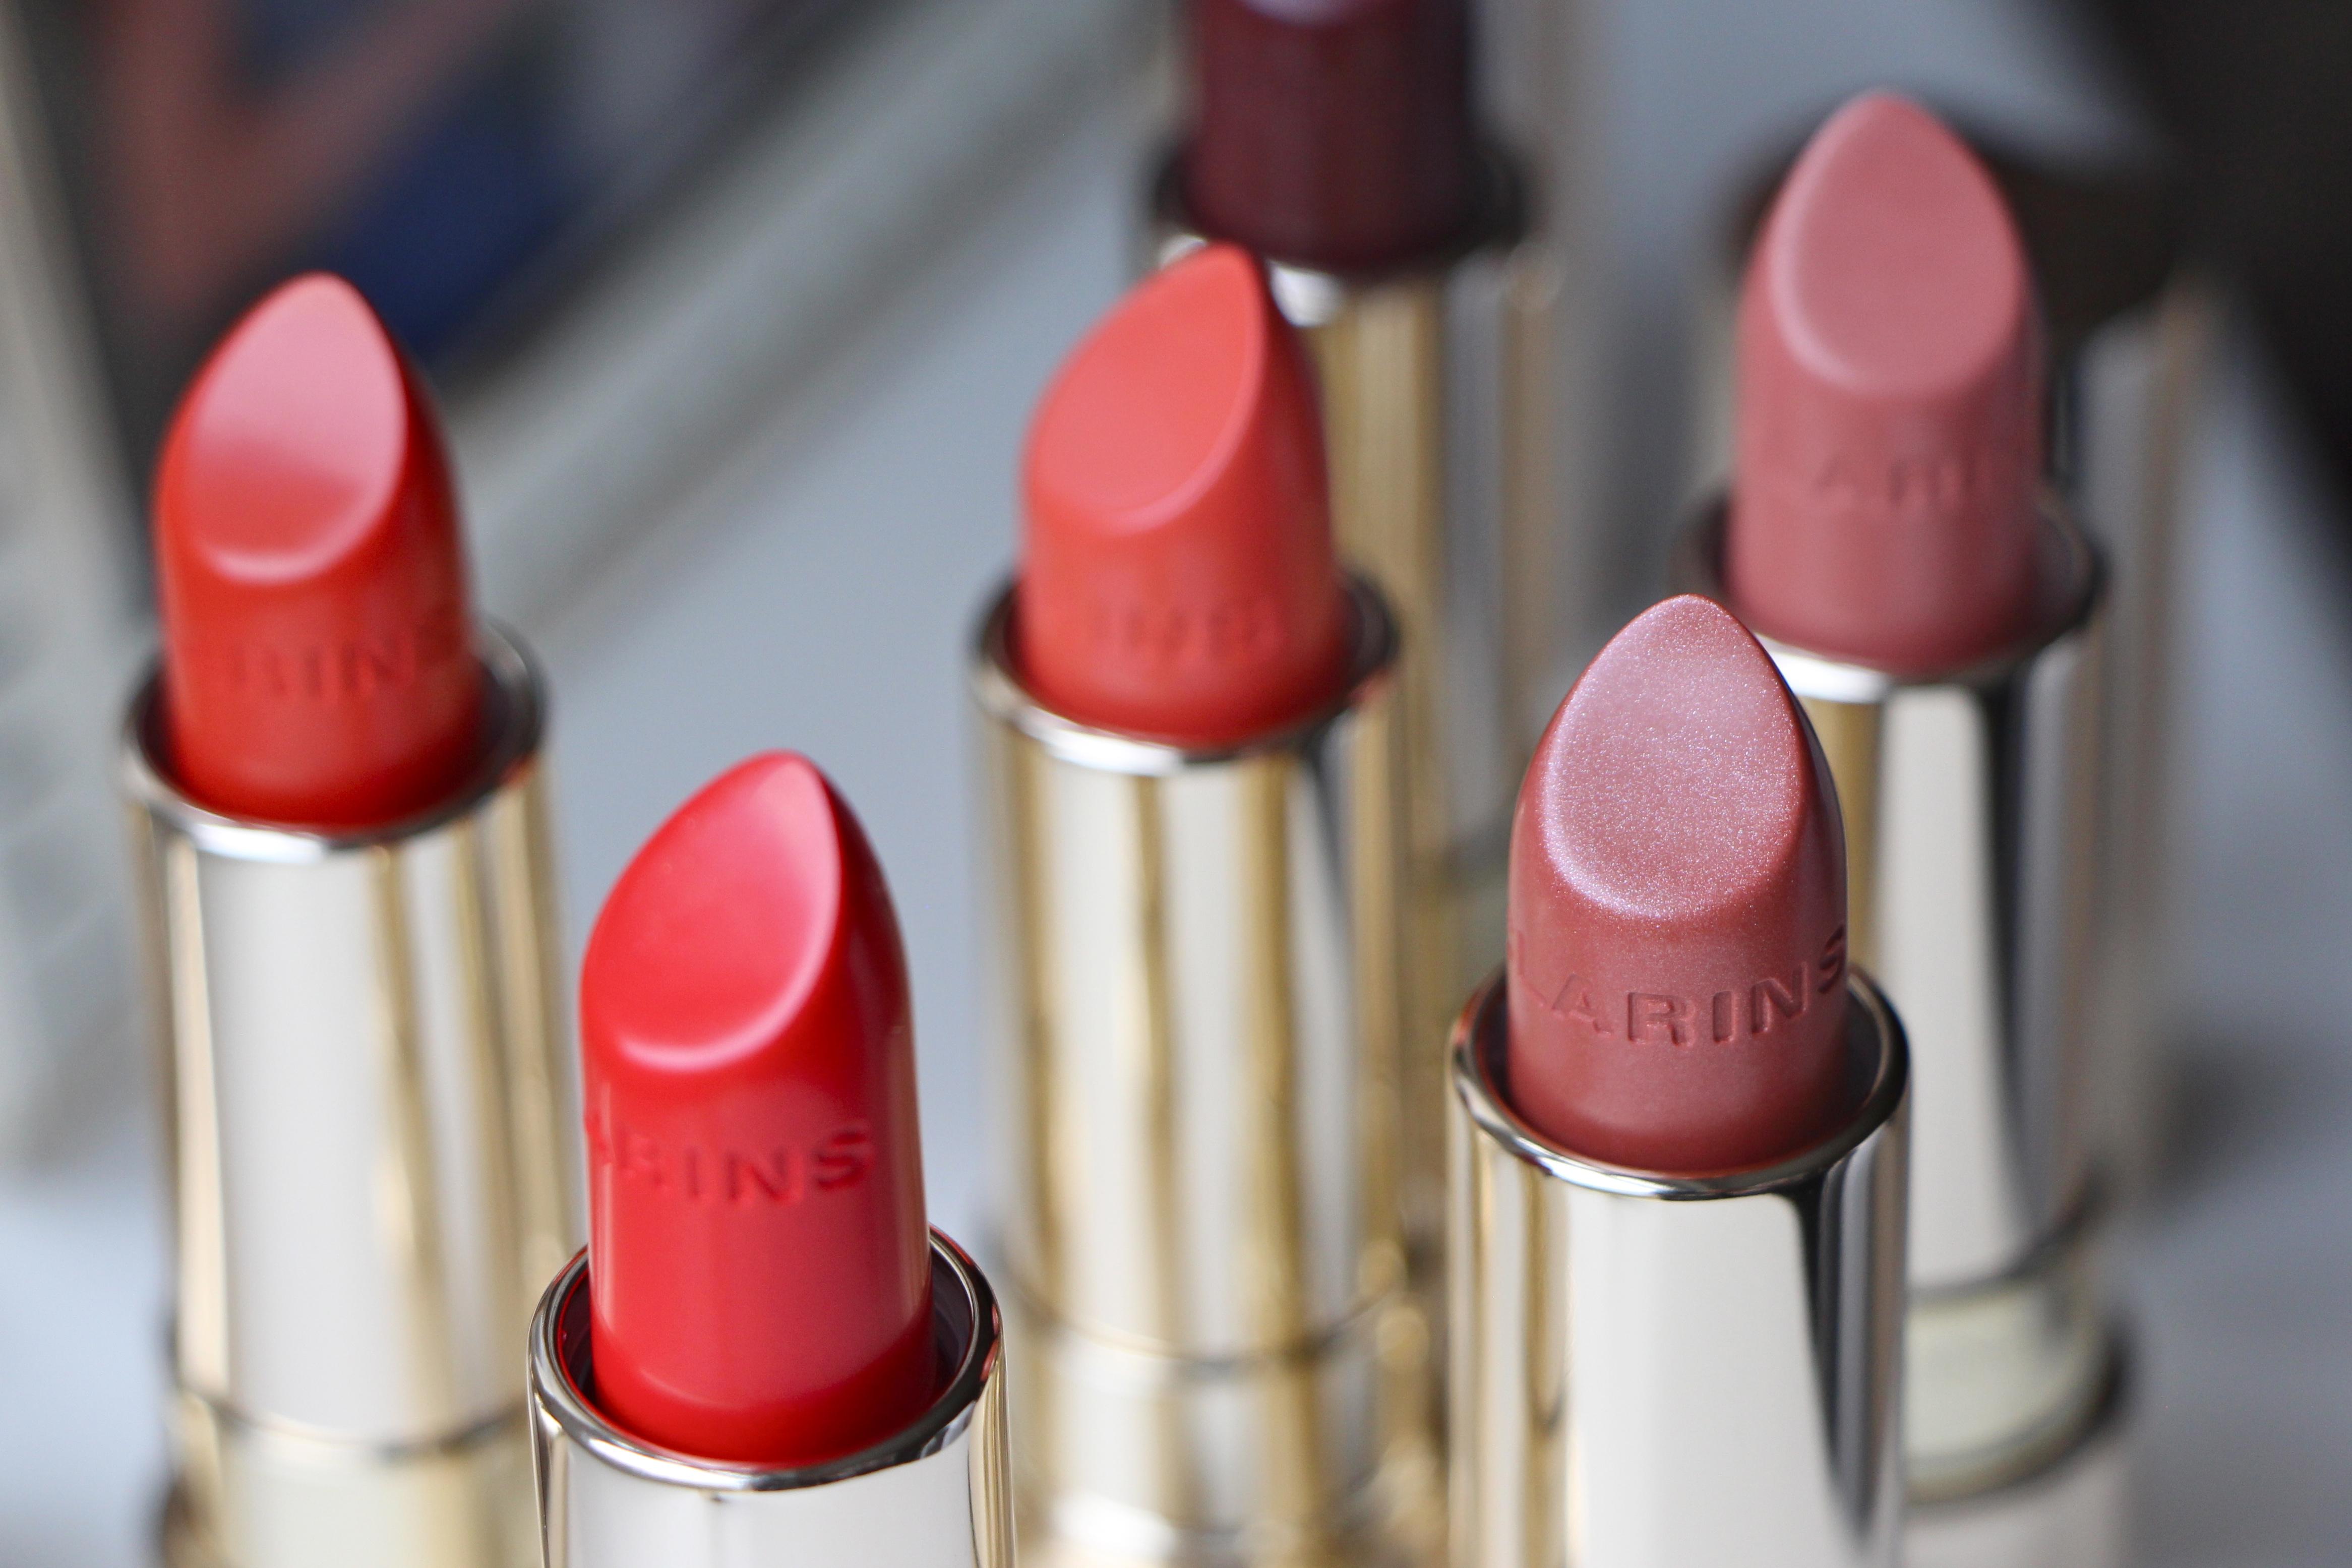 clarins joli rouge lipsticks